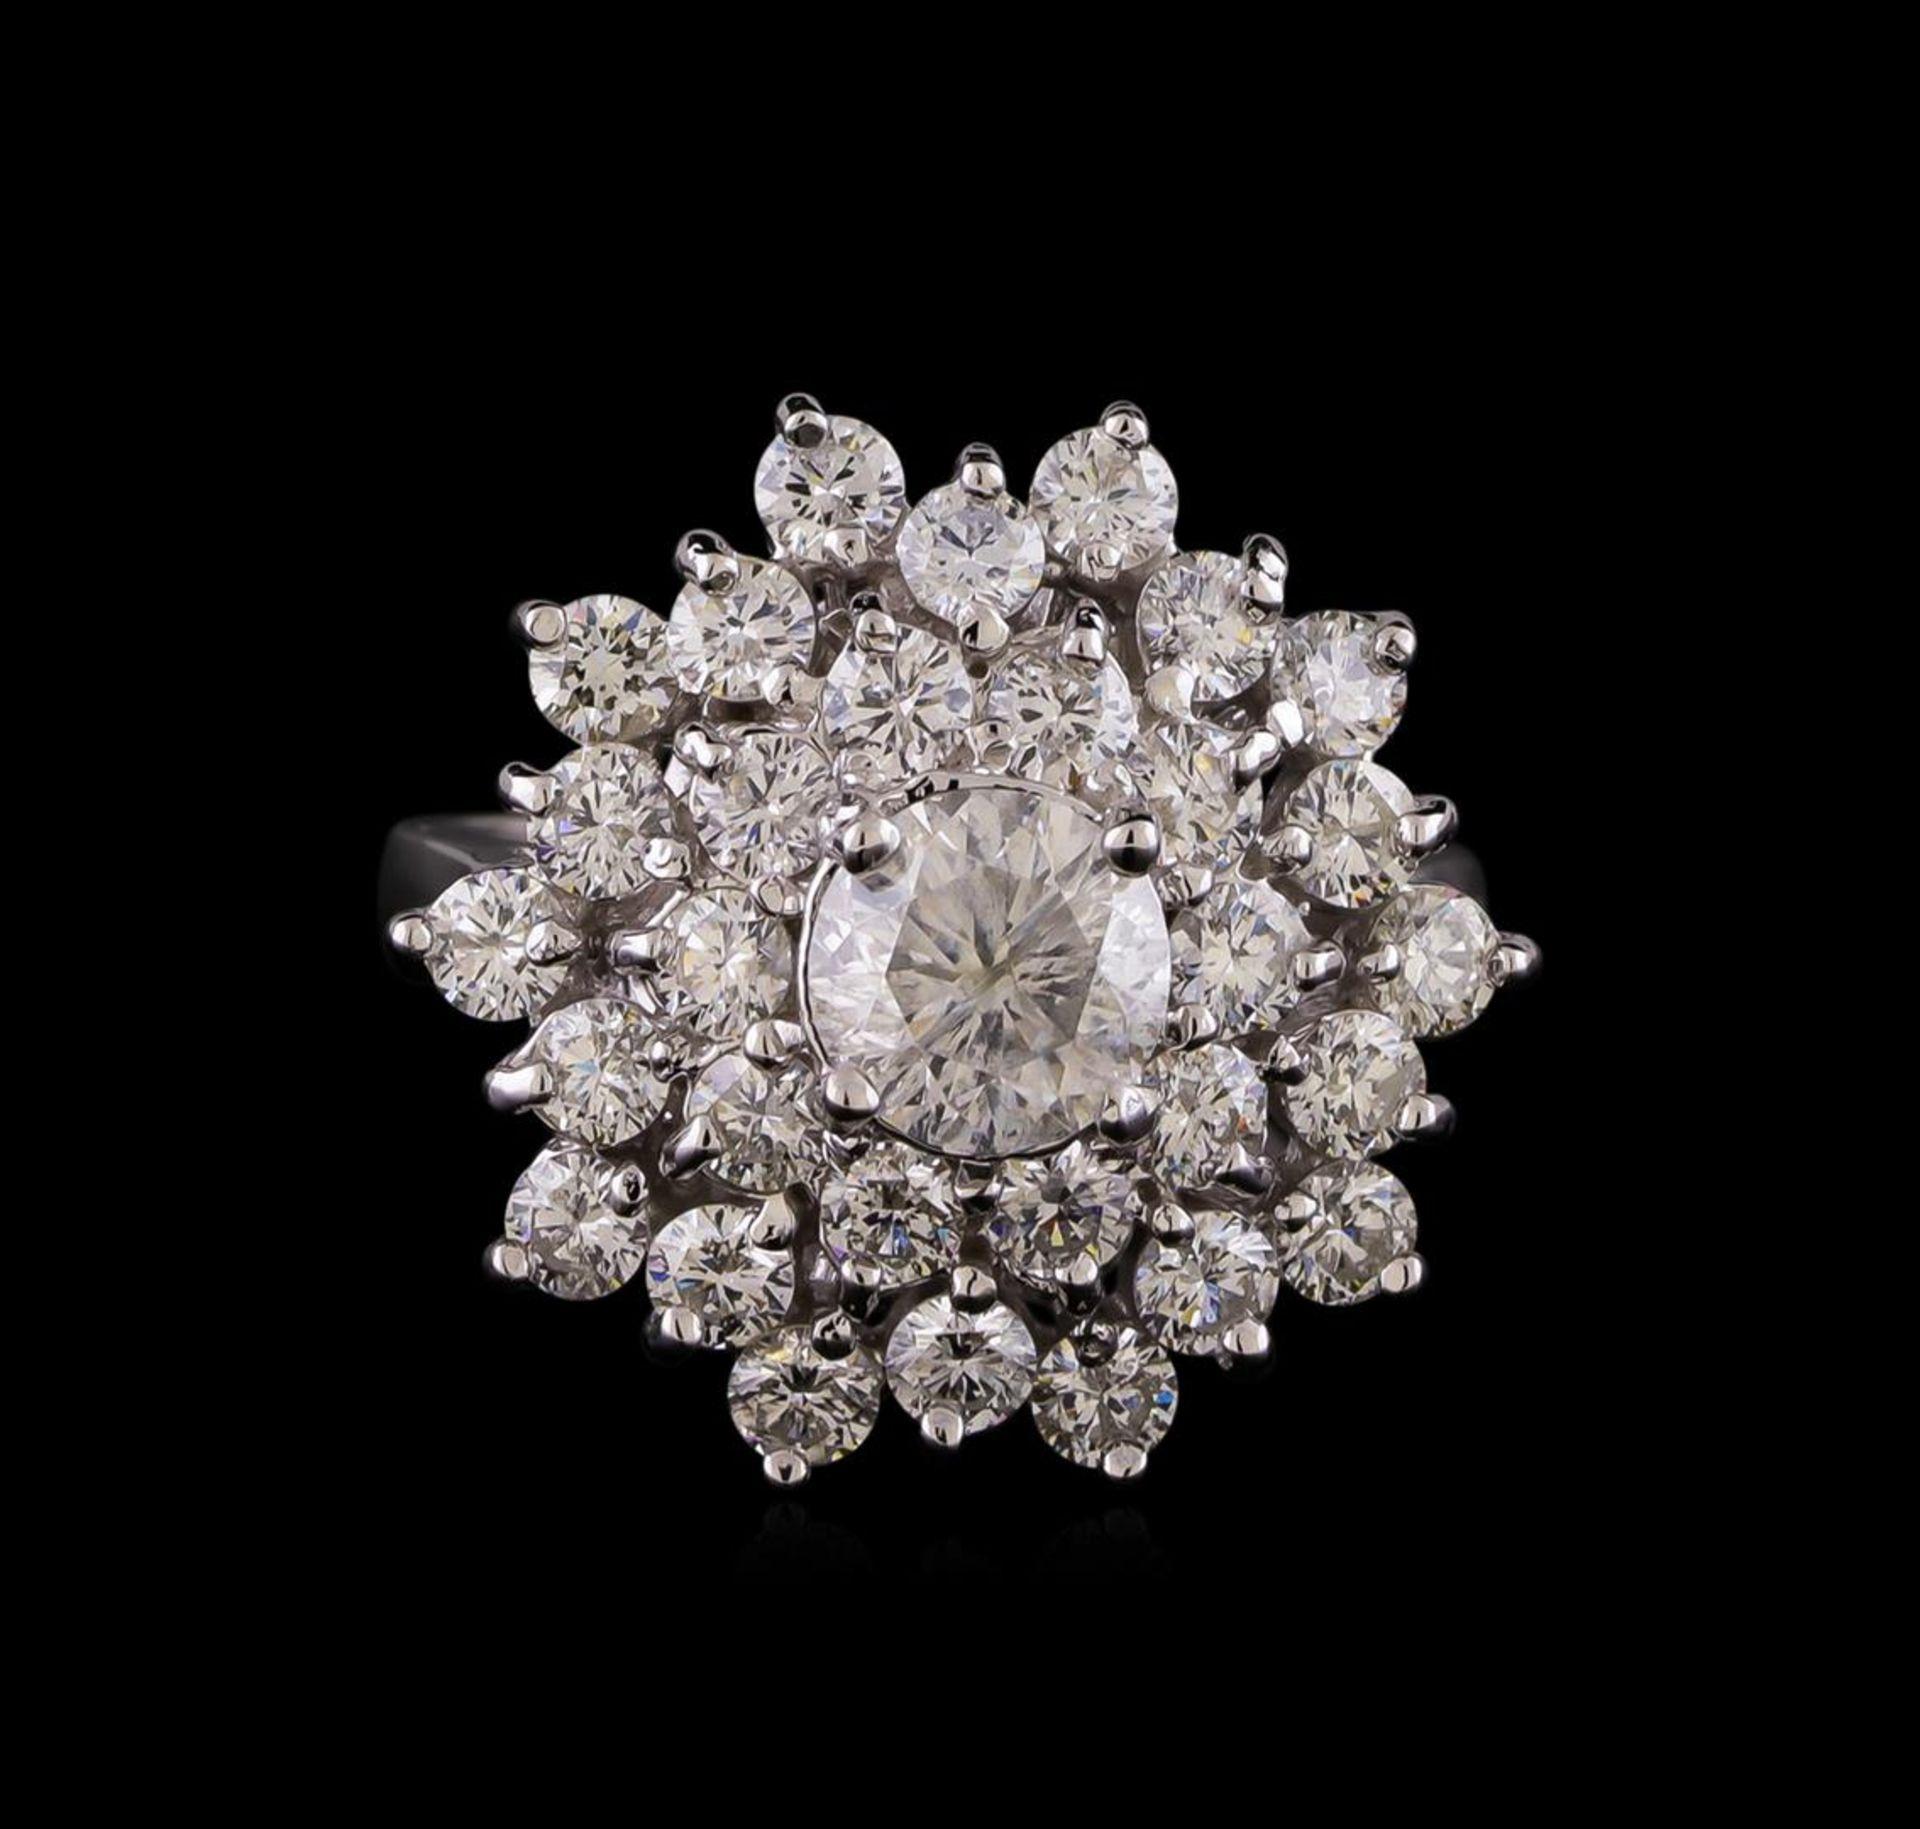 14KT White Gold 2.64 ctw Diamond Ring - Image 2 of 5